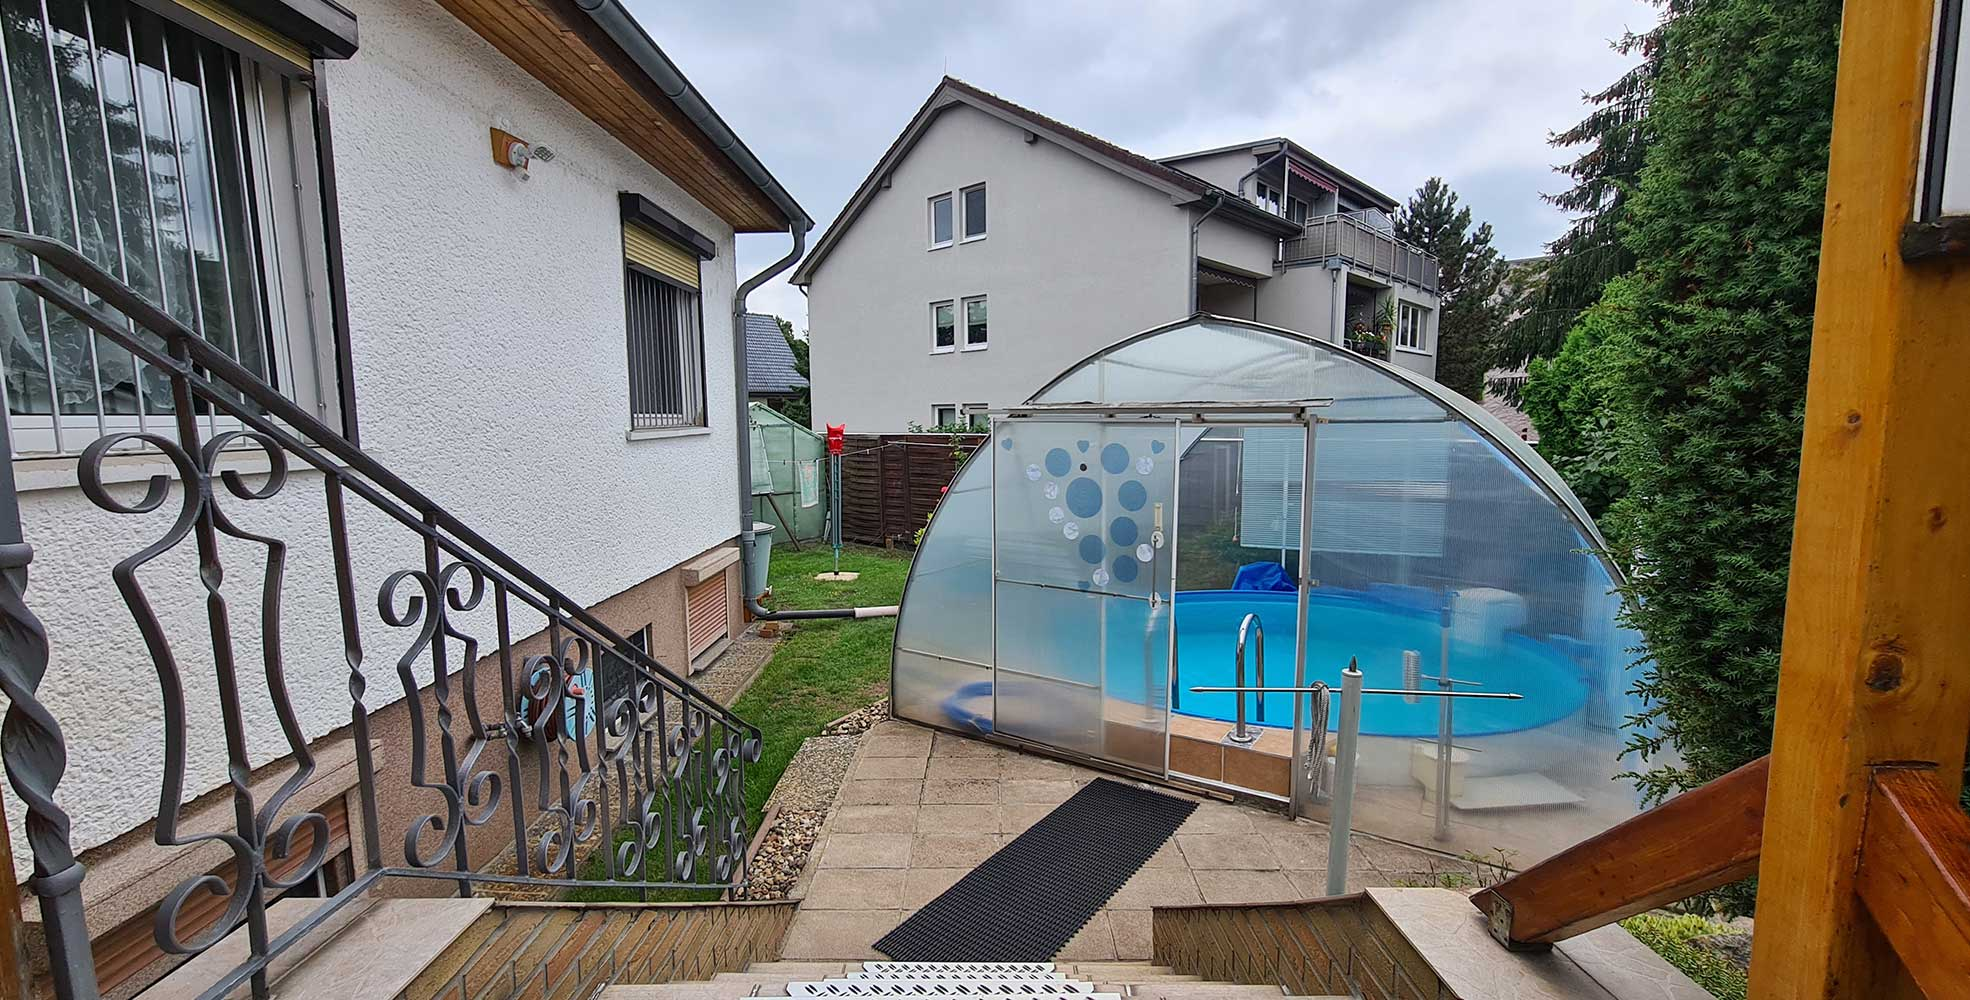 Einfamilienhaus in Berlin - Kaulsdorf - Pool